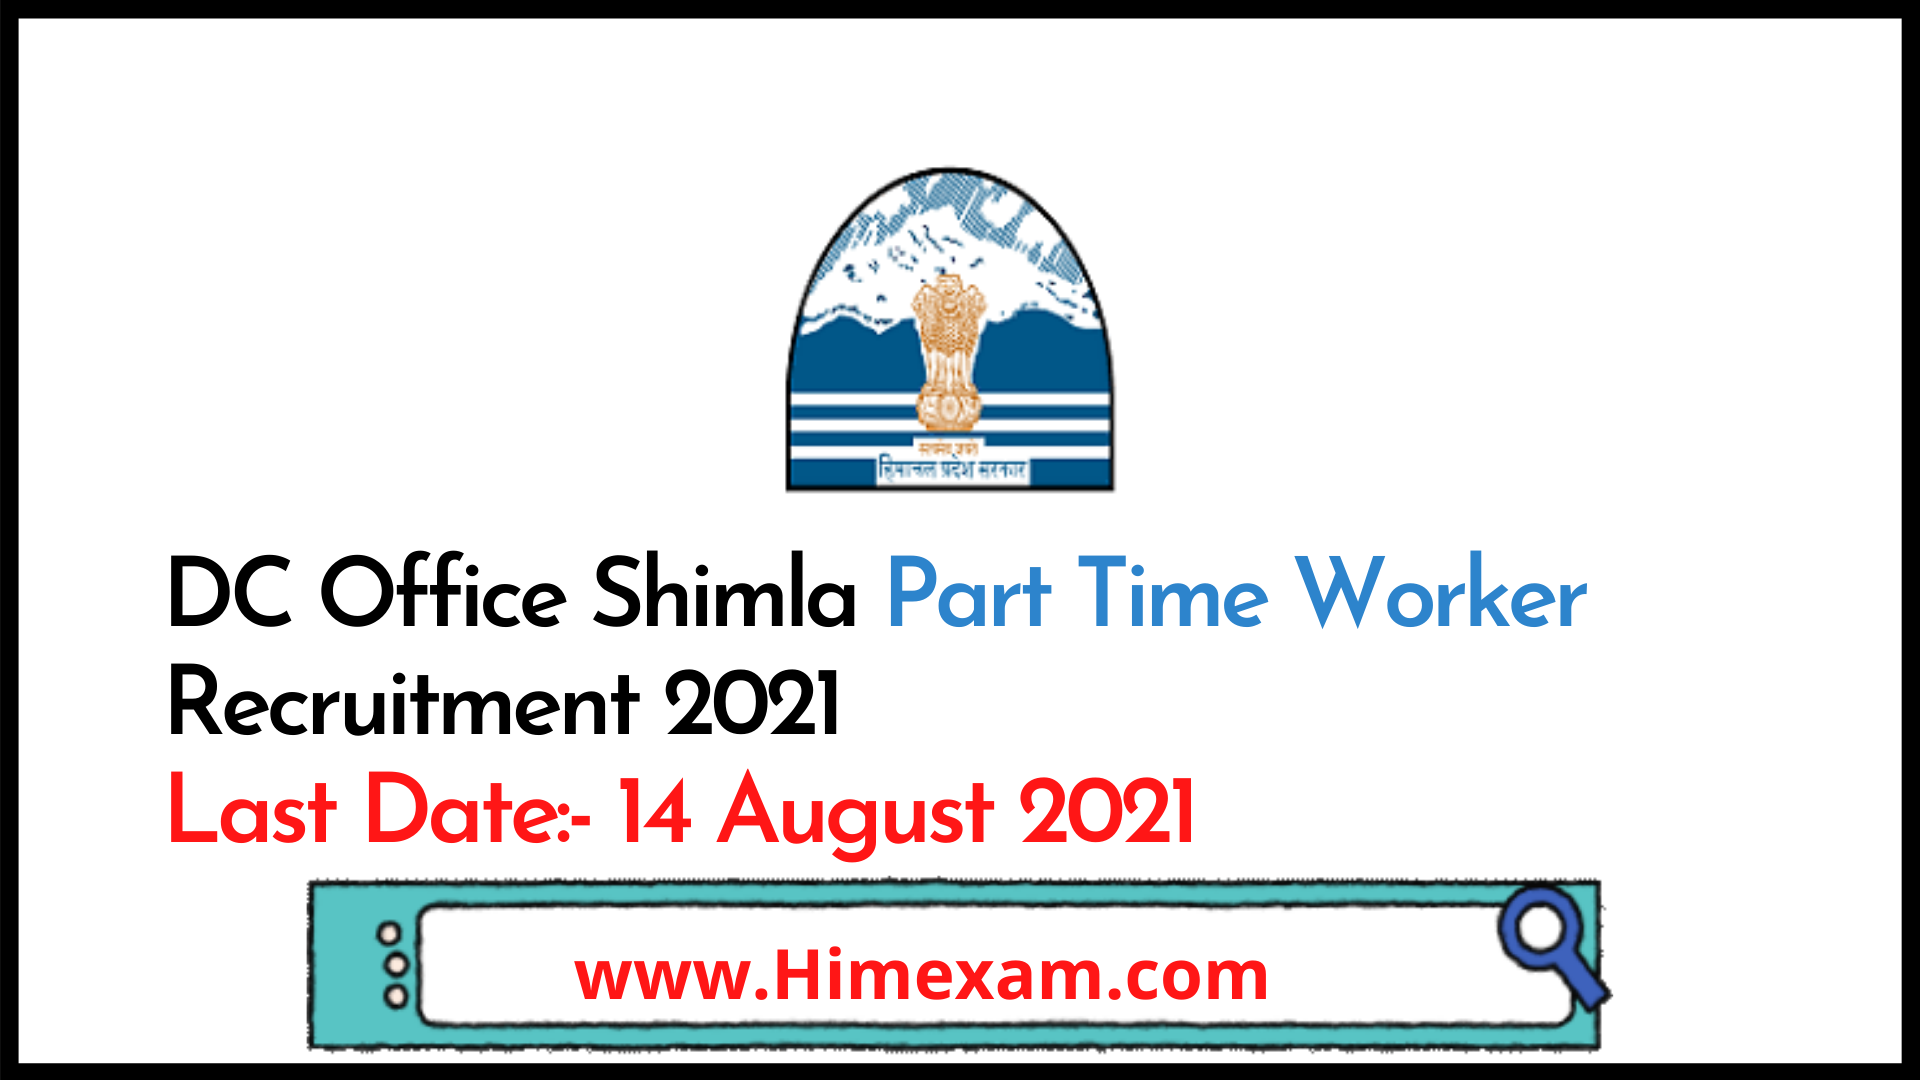 DC Office Shimla Part Time Worker Recruitment 2021